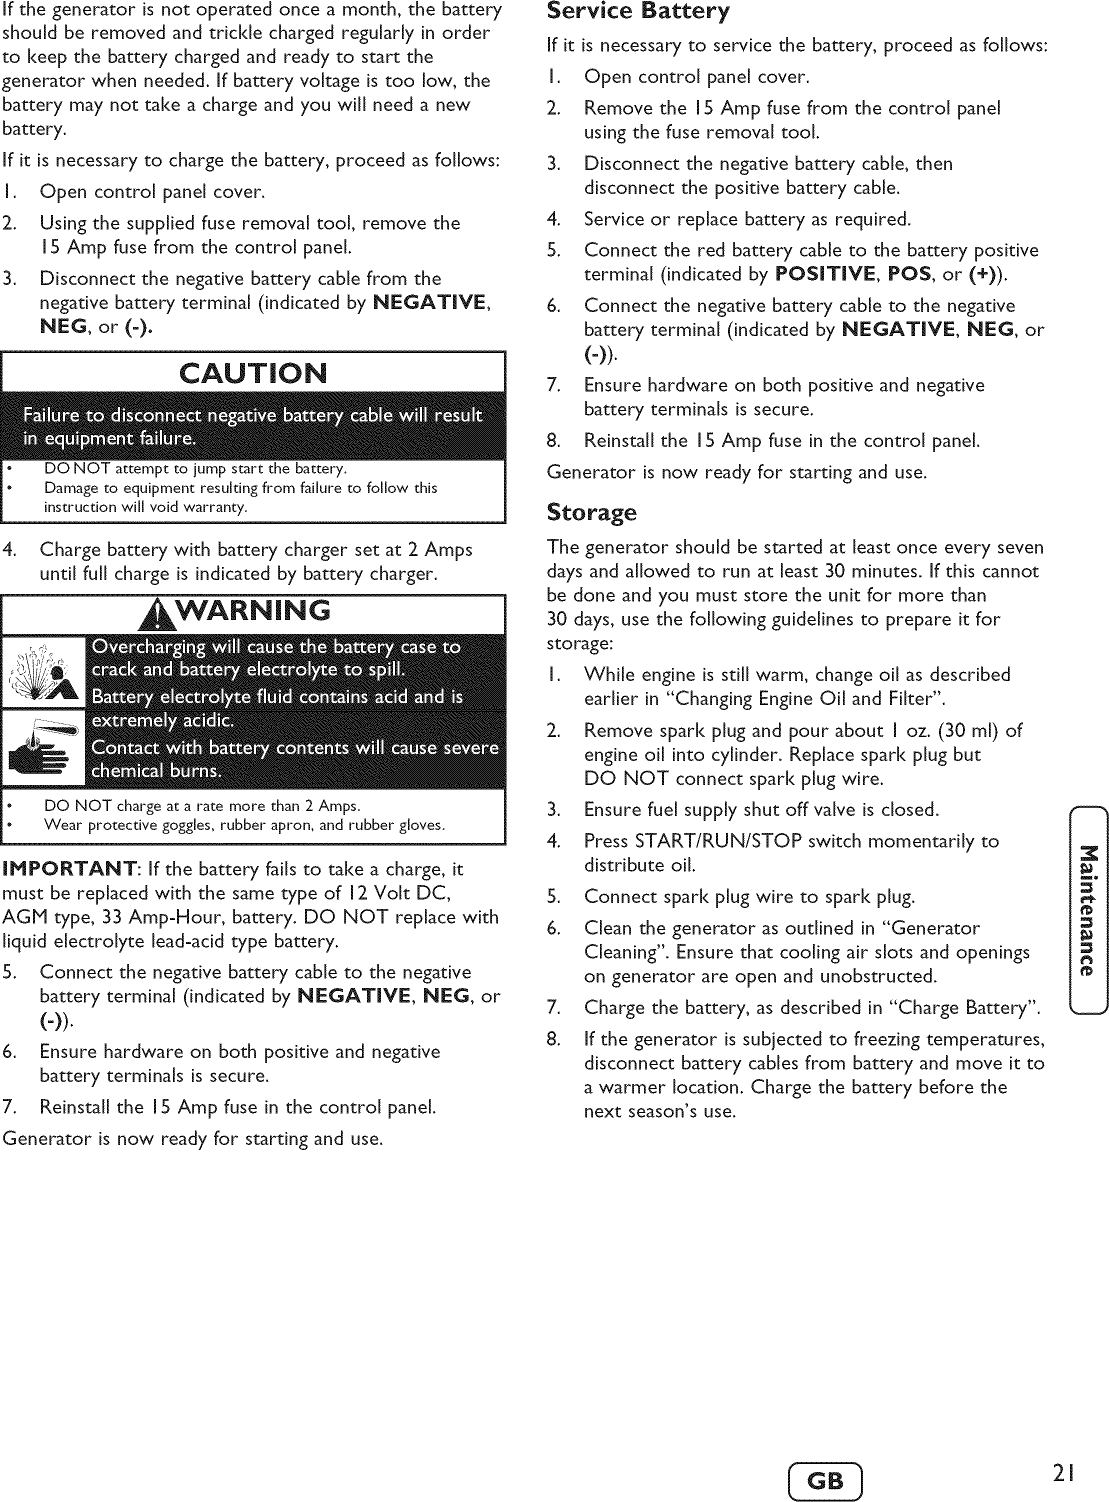 Briggs & Stratton 040248 User Manual BACKUP GENERATOR